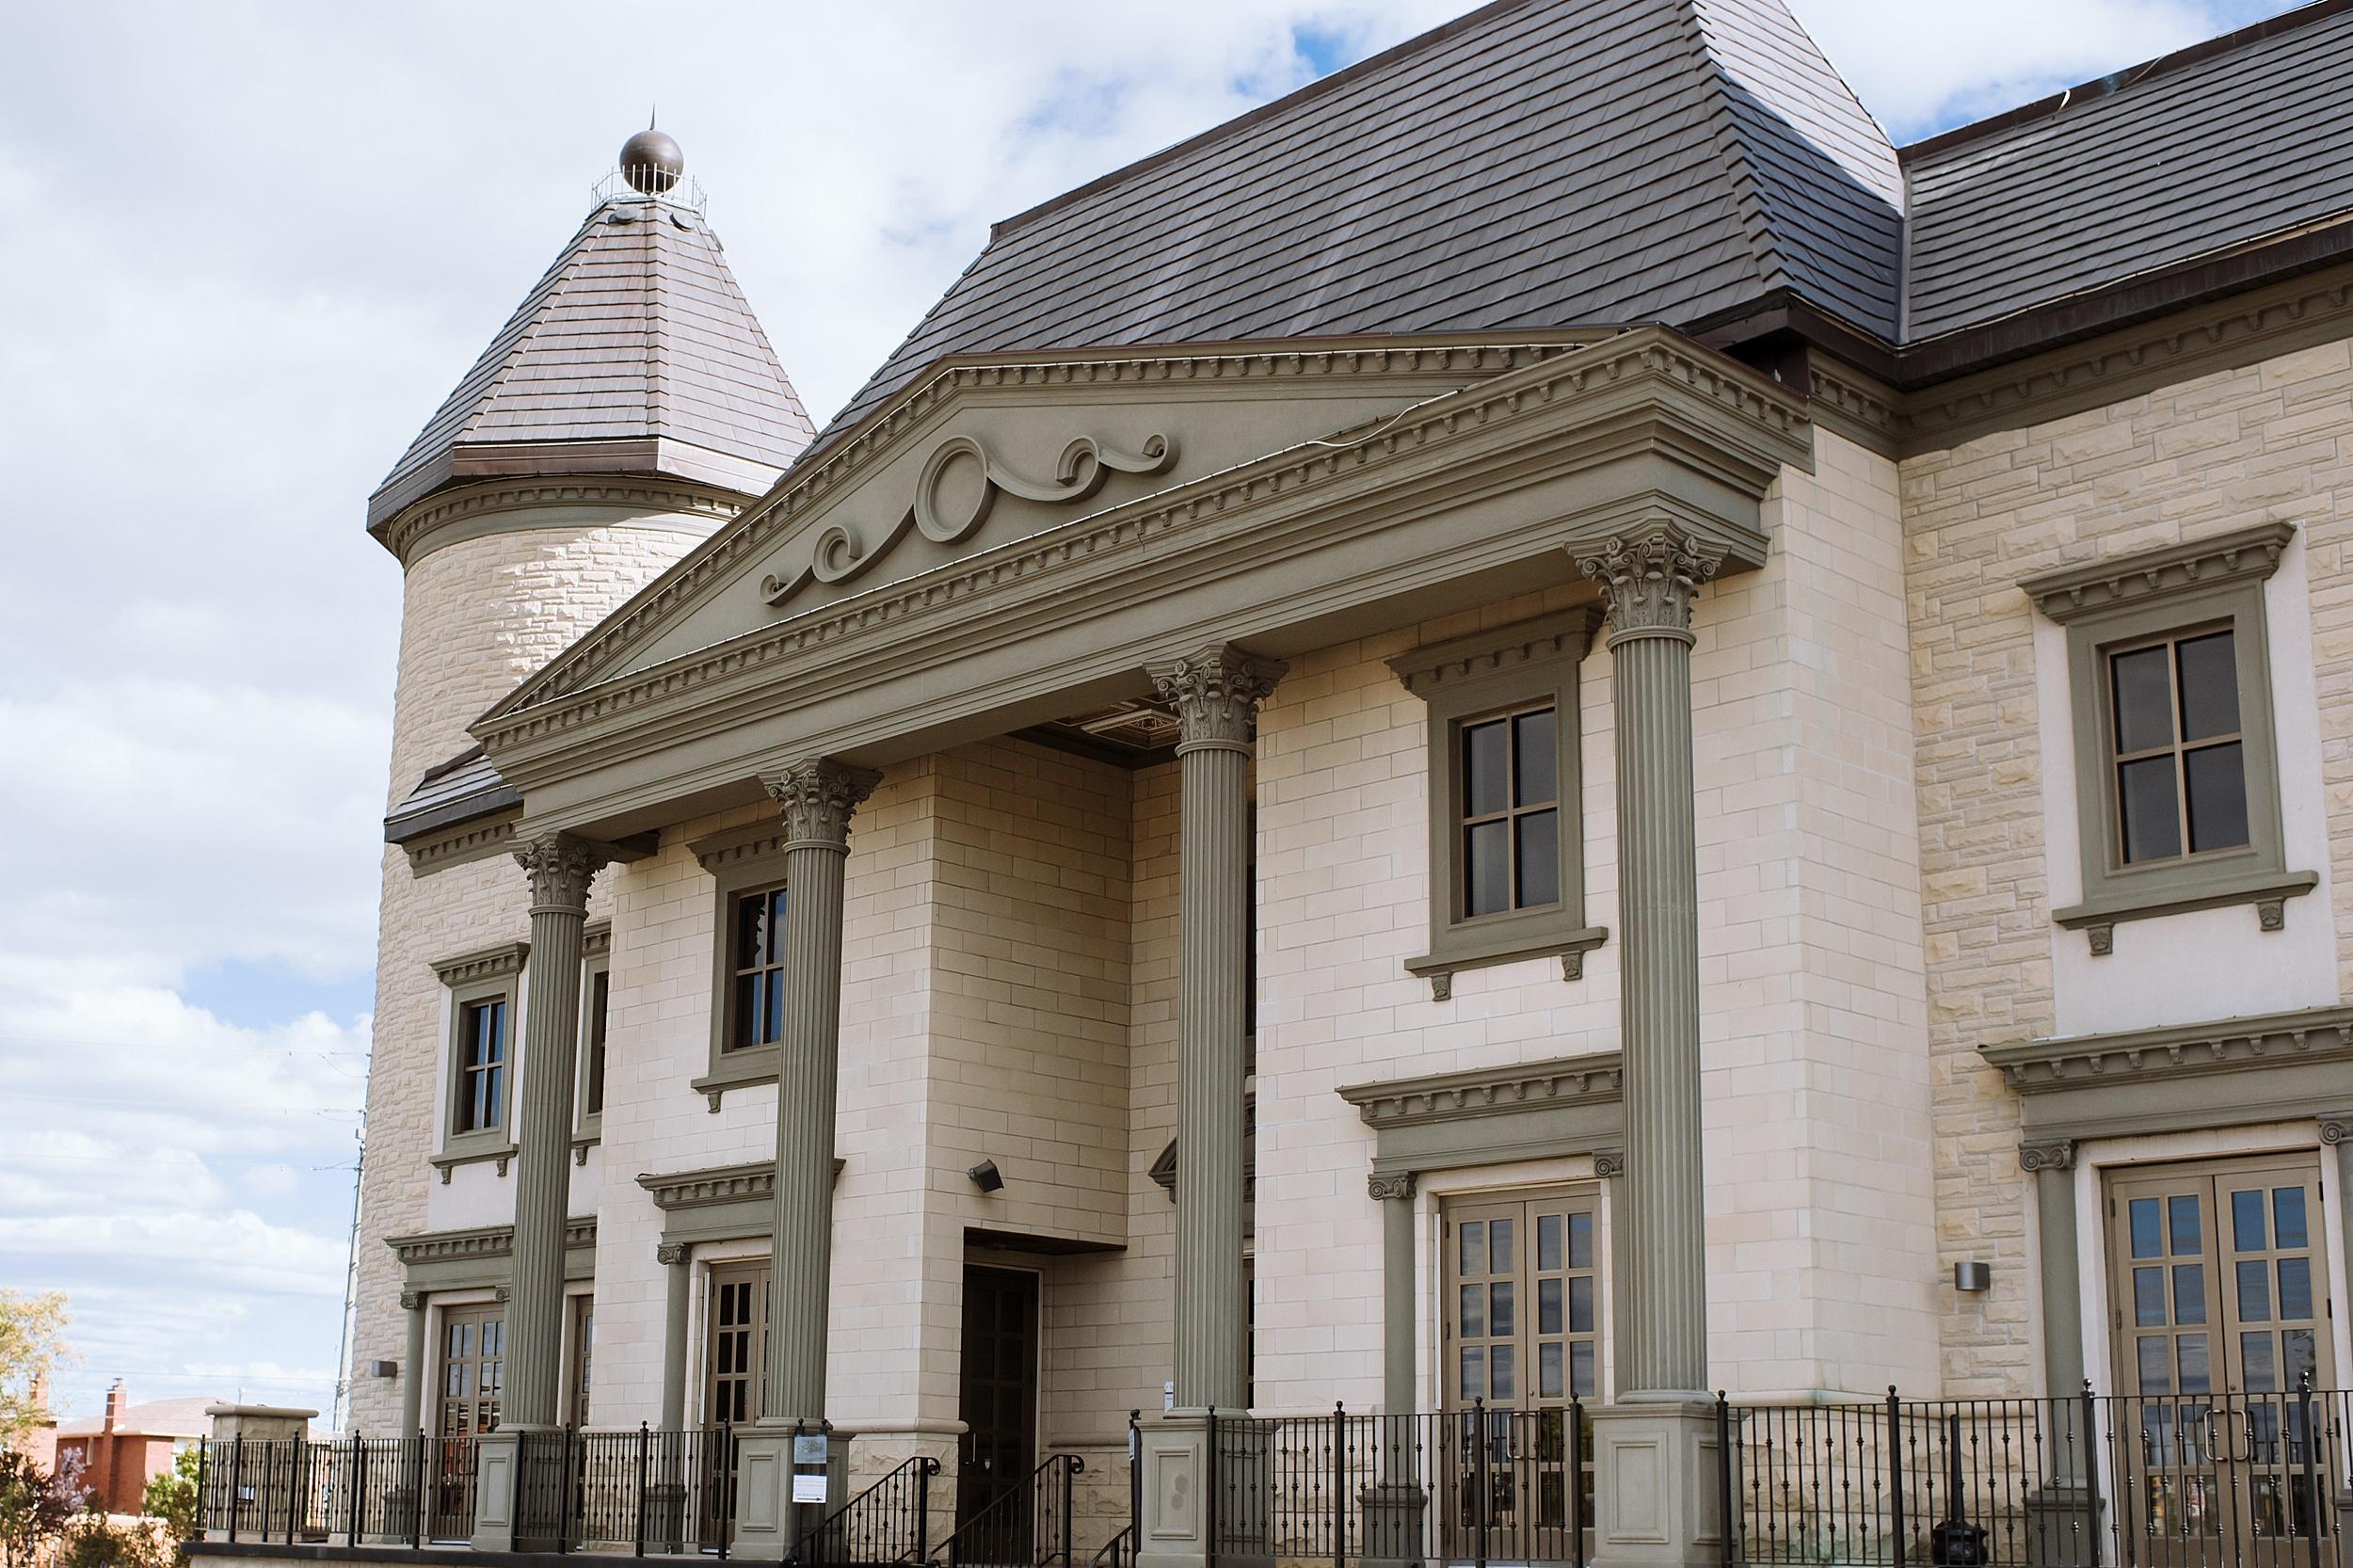 McMichael_Art_Collection_Wedding_chateau_le_jardin_Justine_Munro_Toronto_Photographer040.jpg